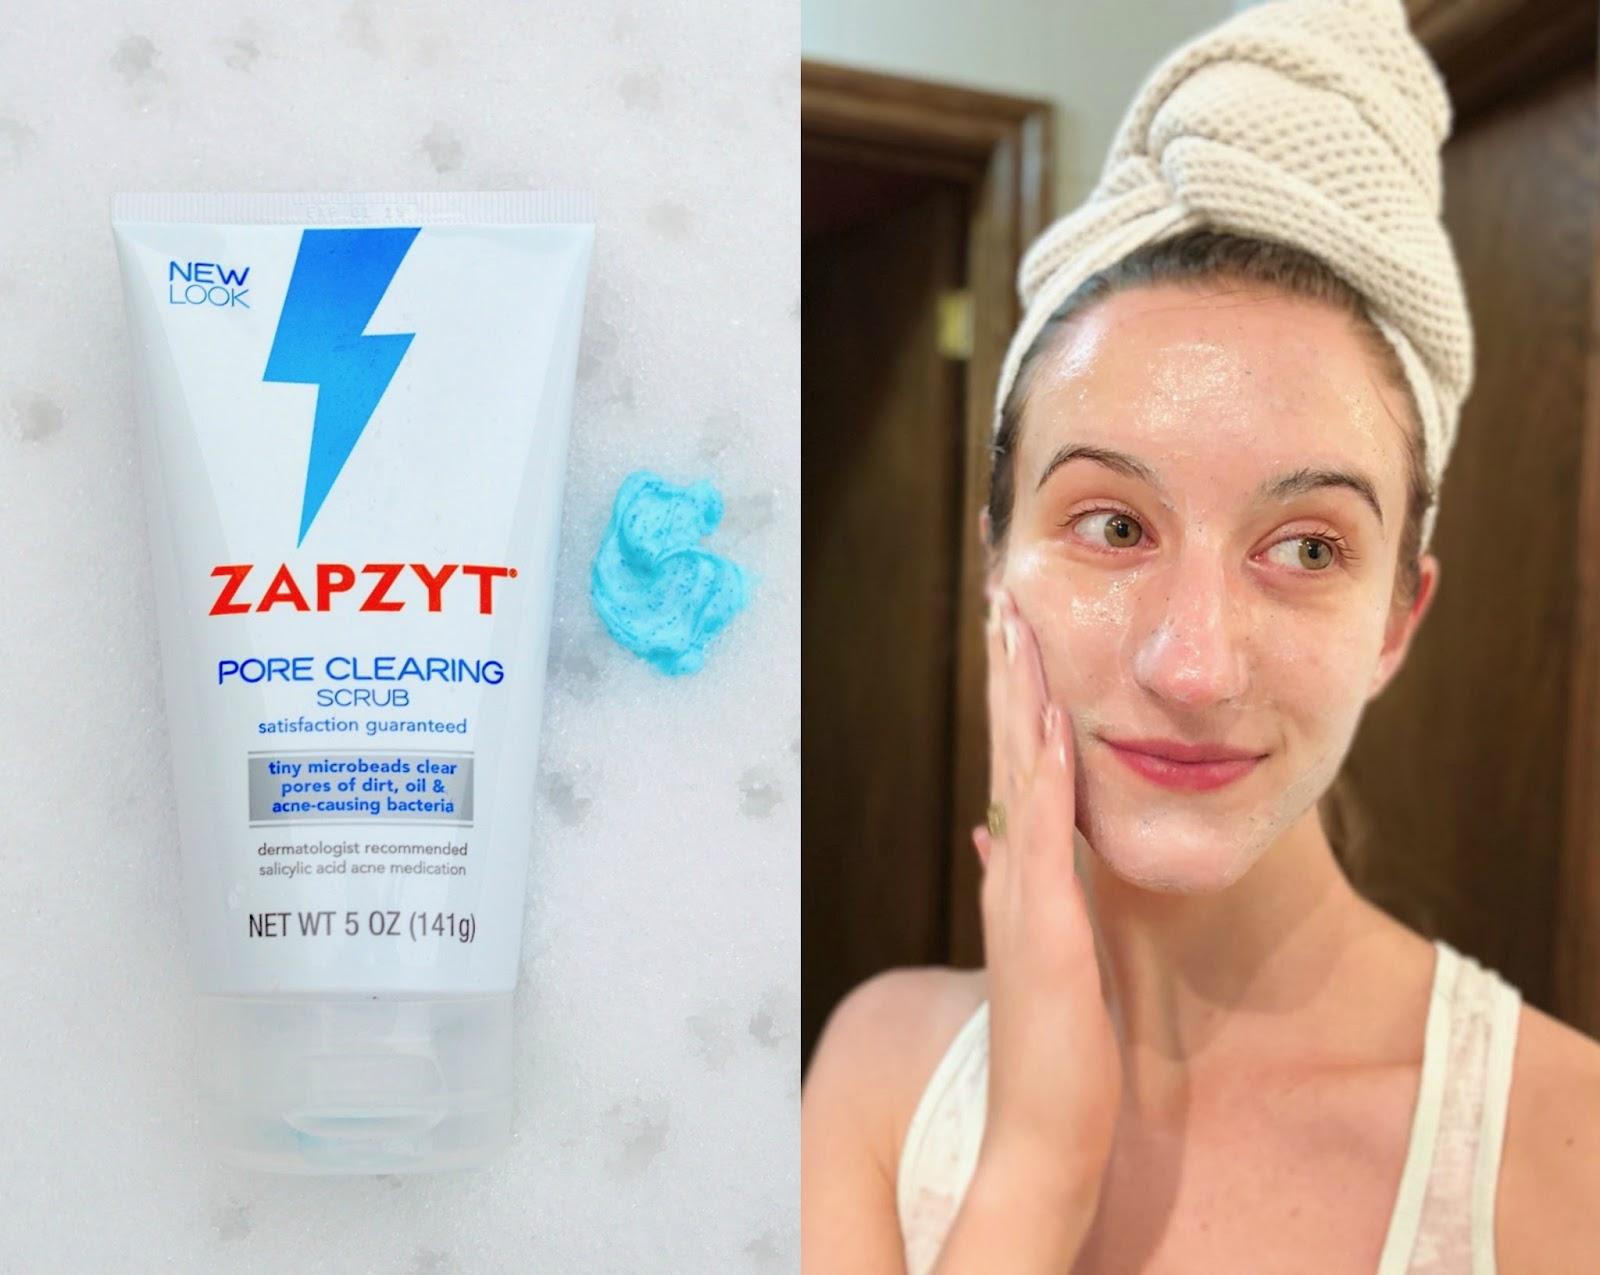 Zapzyt Pore Clearing Scrub